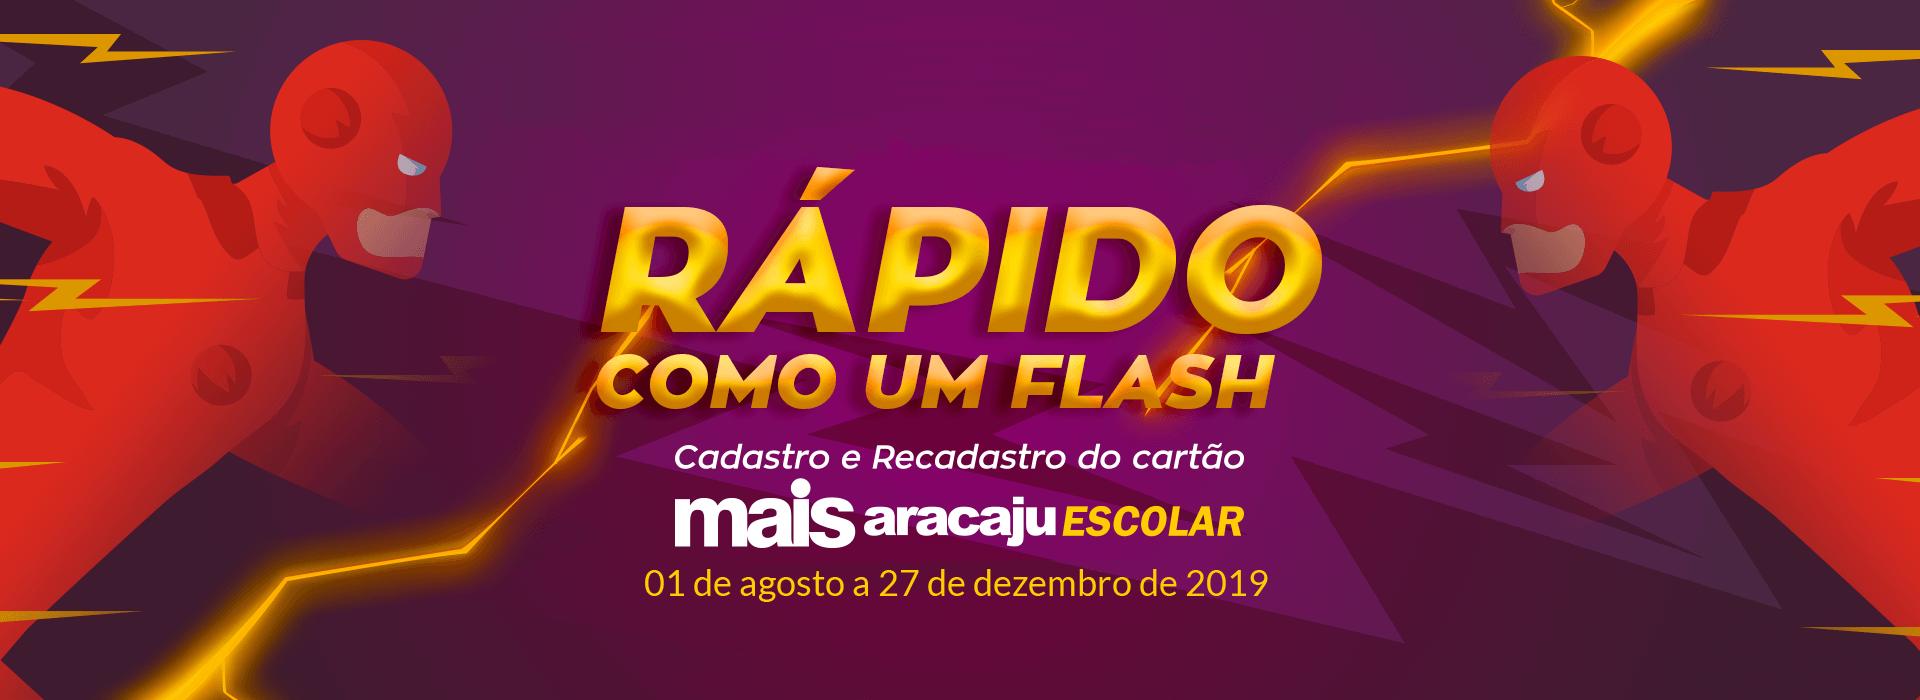 ARACAJUCARD-lancamentosite-web-banner-1920x700-slide2